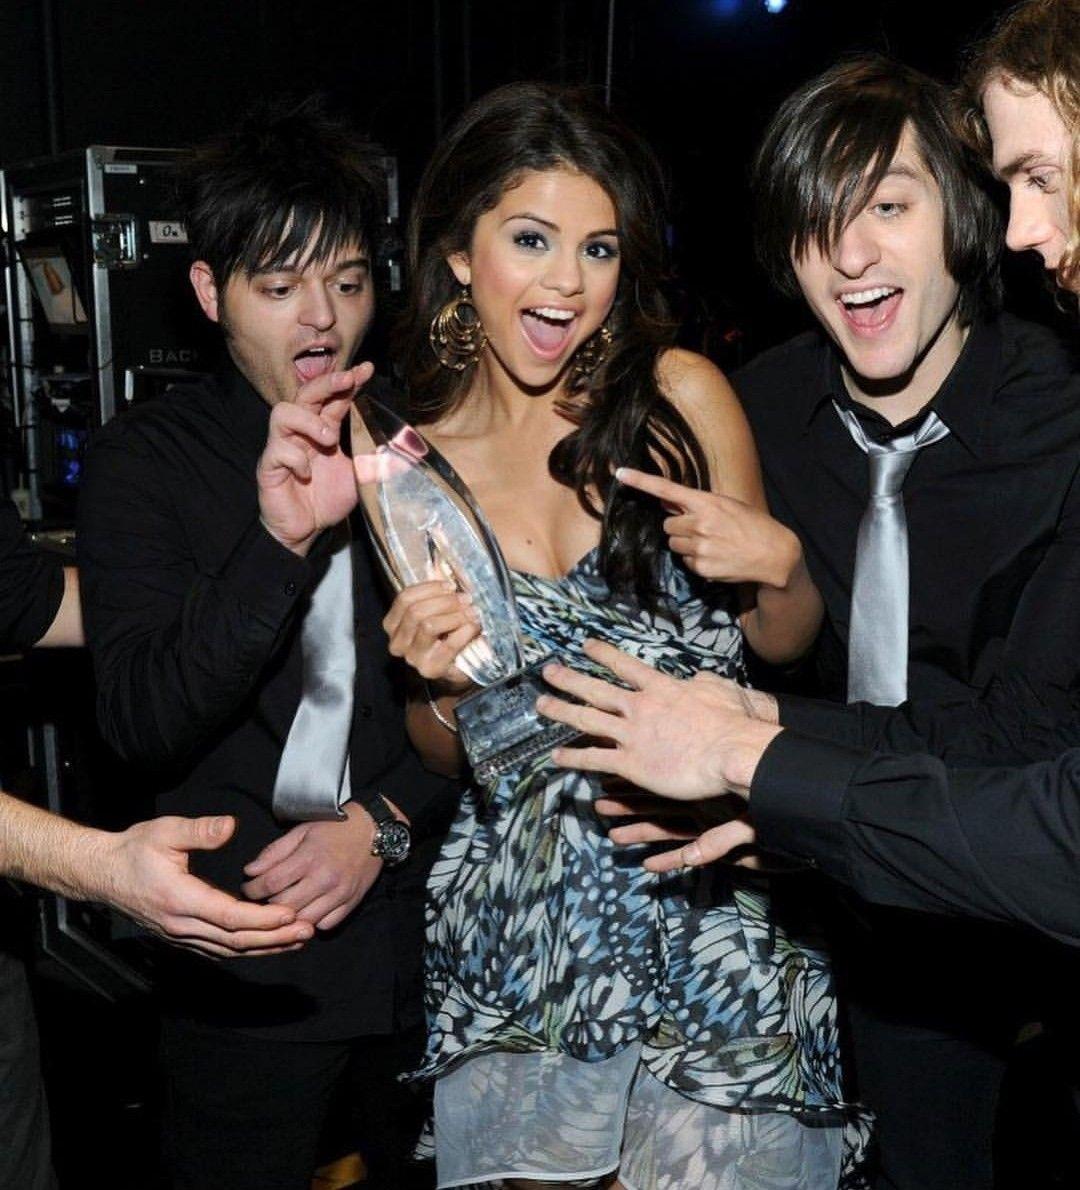 Pin by Betül on Awards | Selena gomez, Selena, Fictional ...